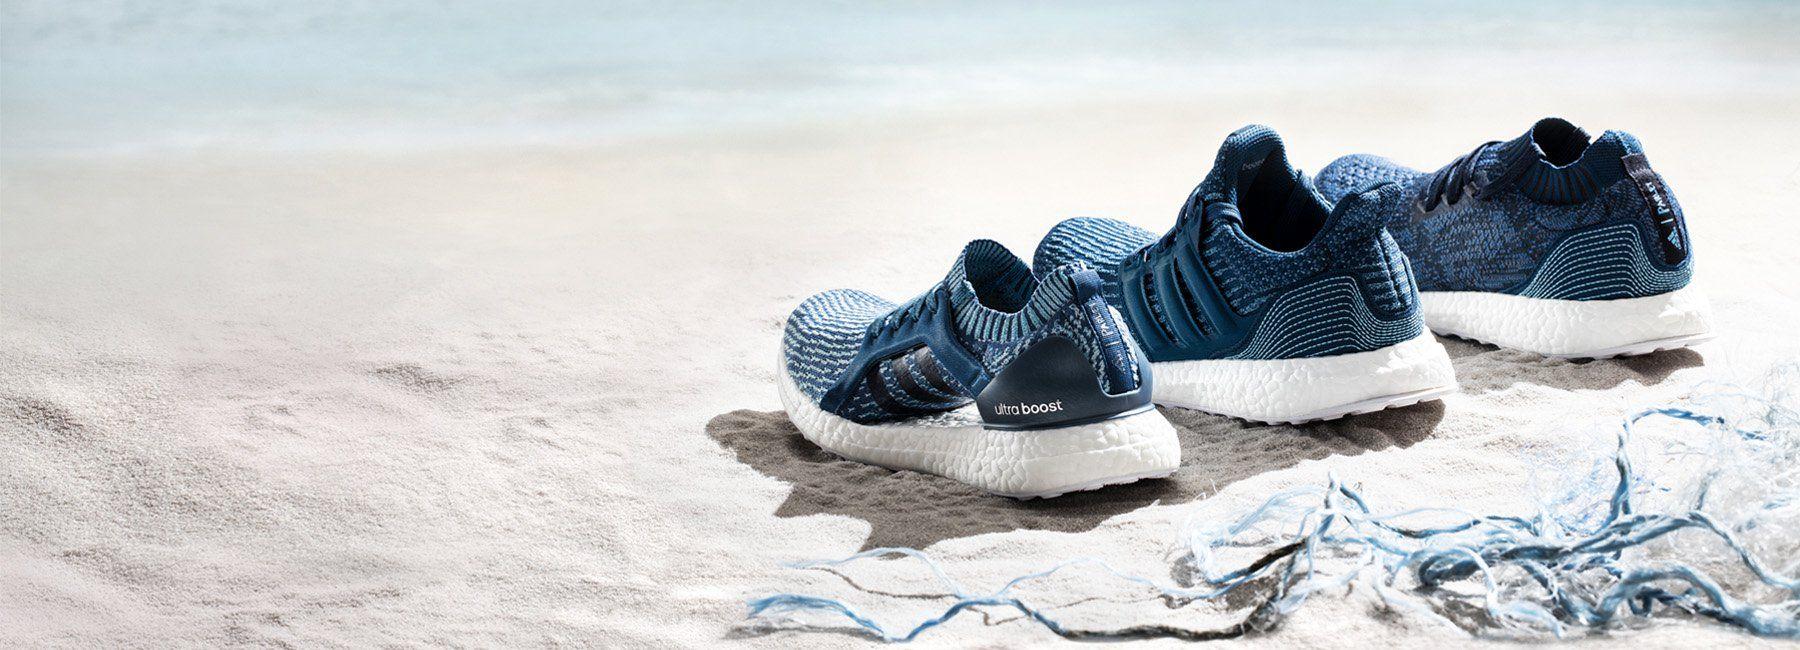 ADIDAS ULTRABOOST PARLEY ST Running Shoes Ocean Plastic